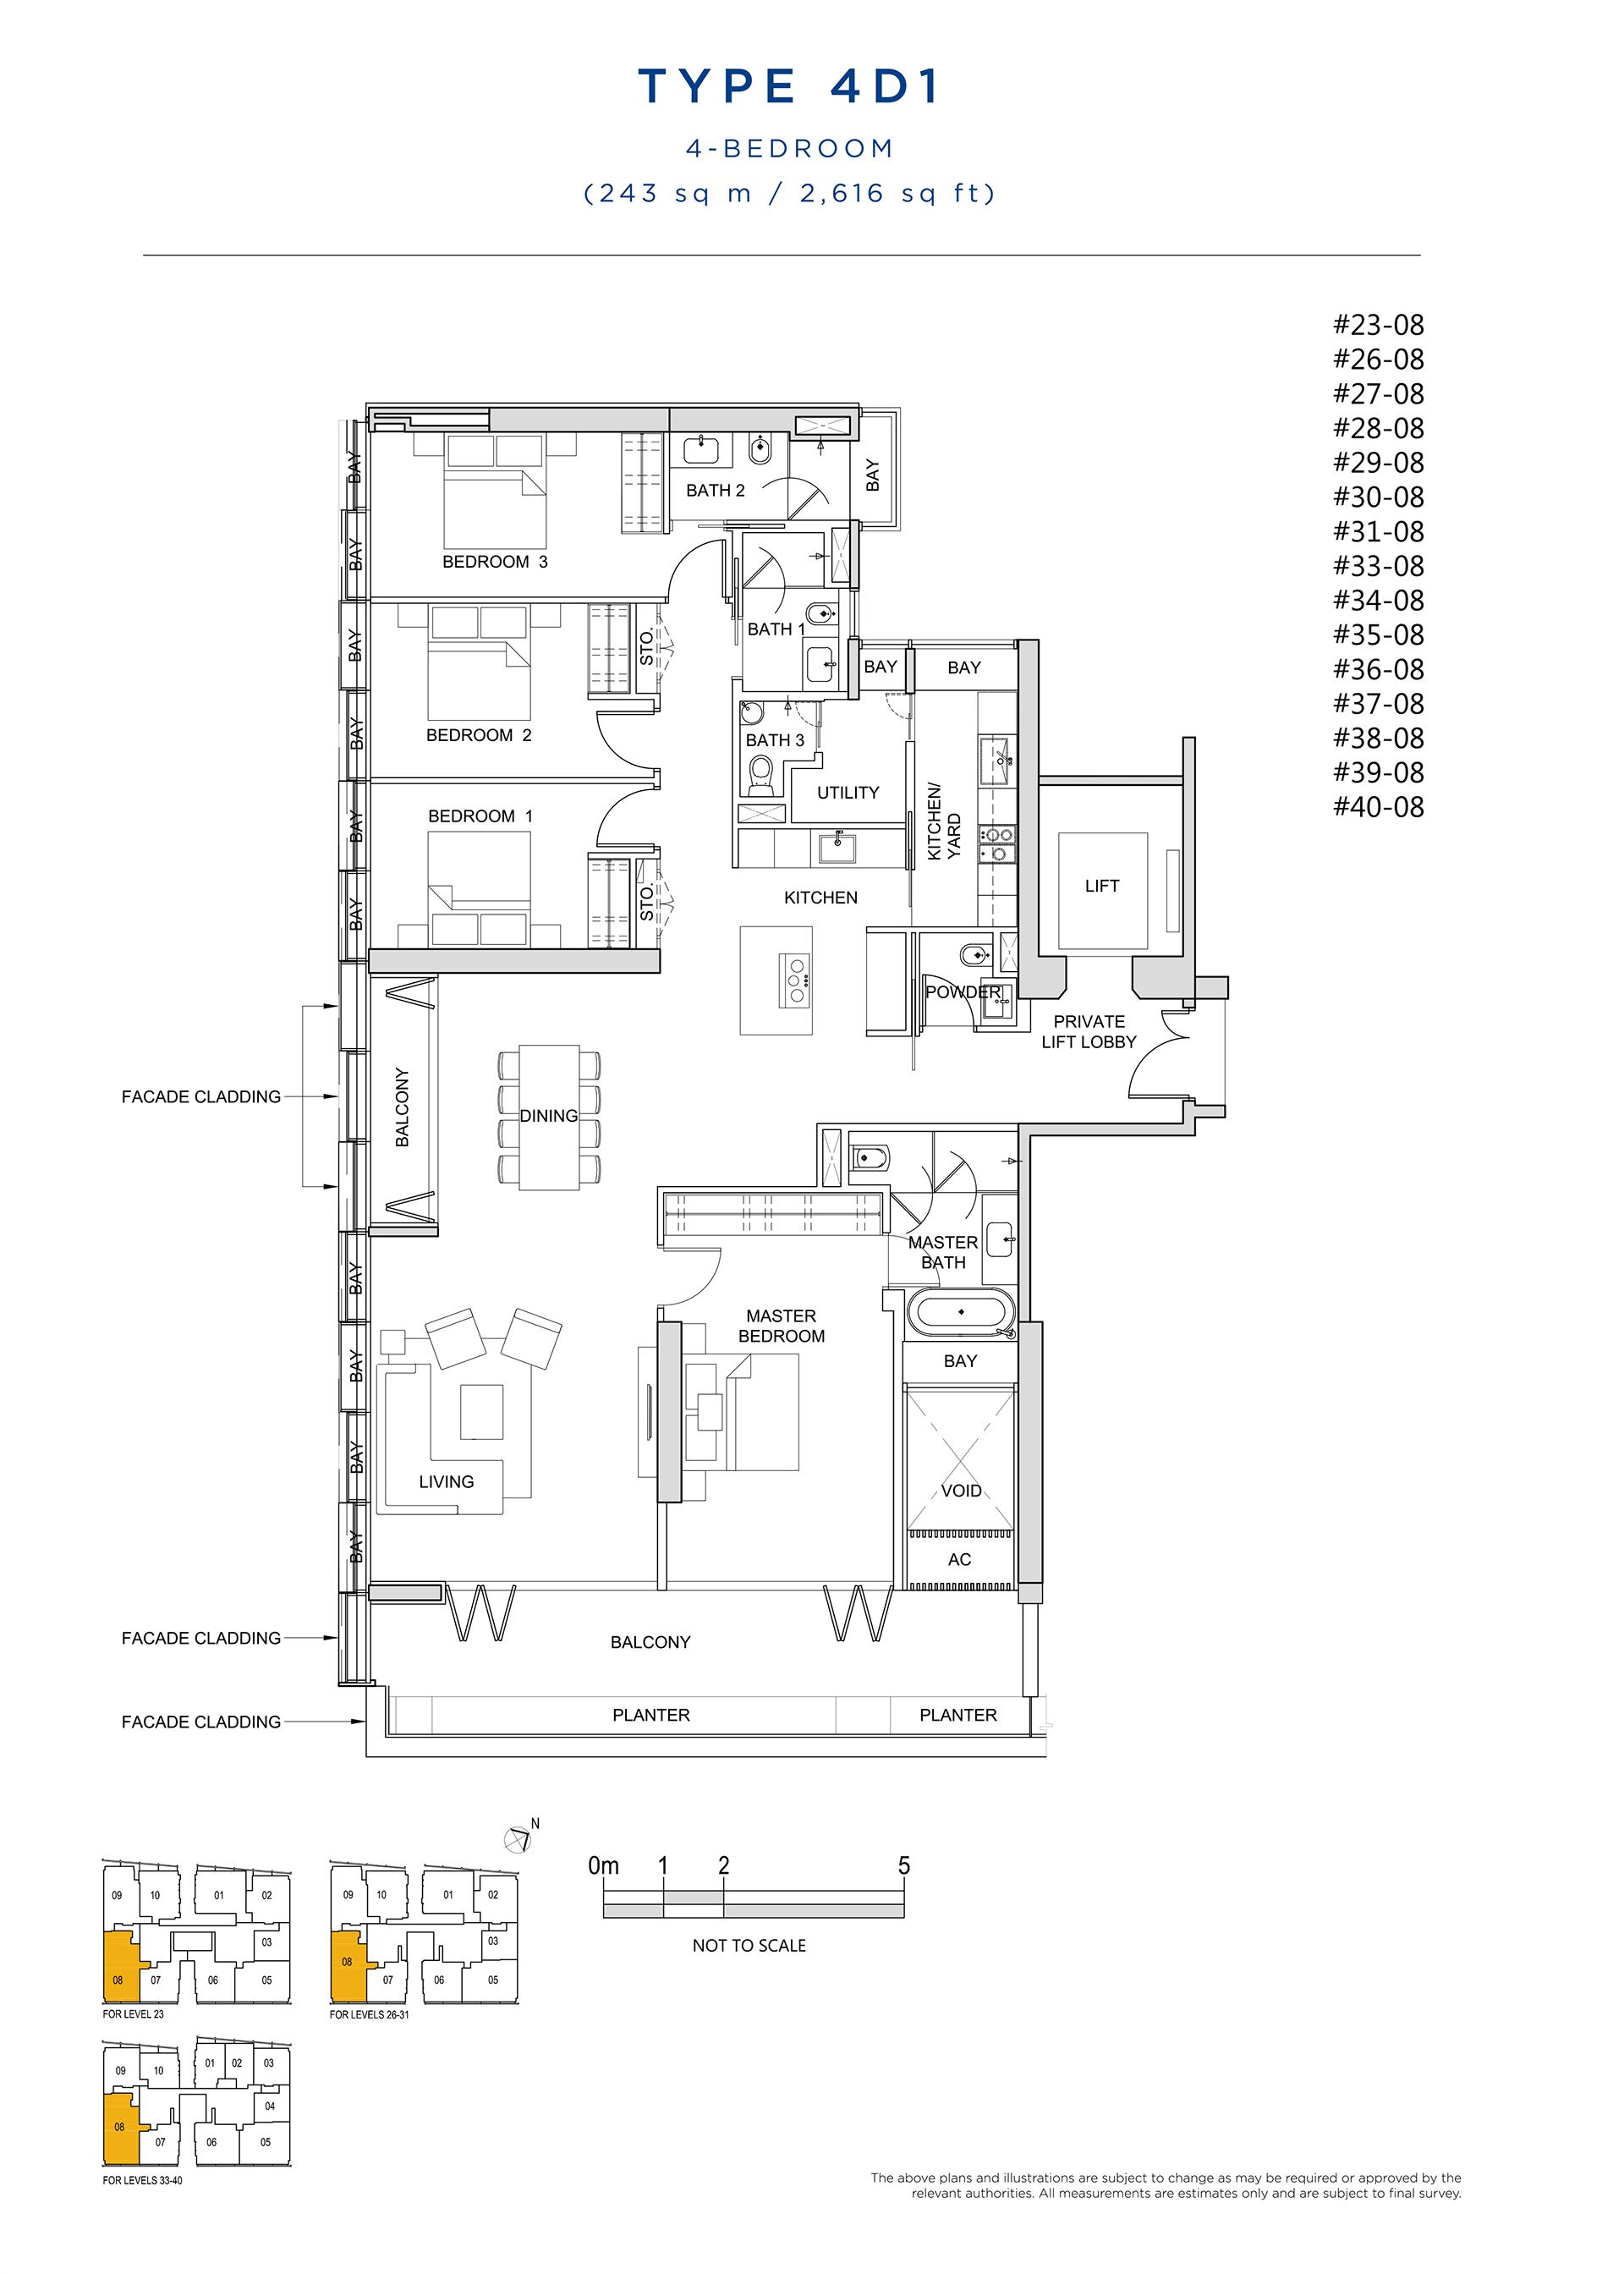 South Beach Residences 4 Bedroom Floor Plan Type 4D1